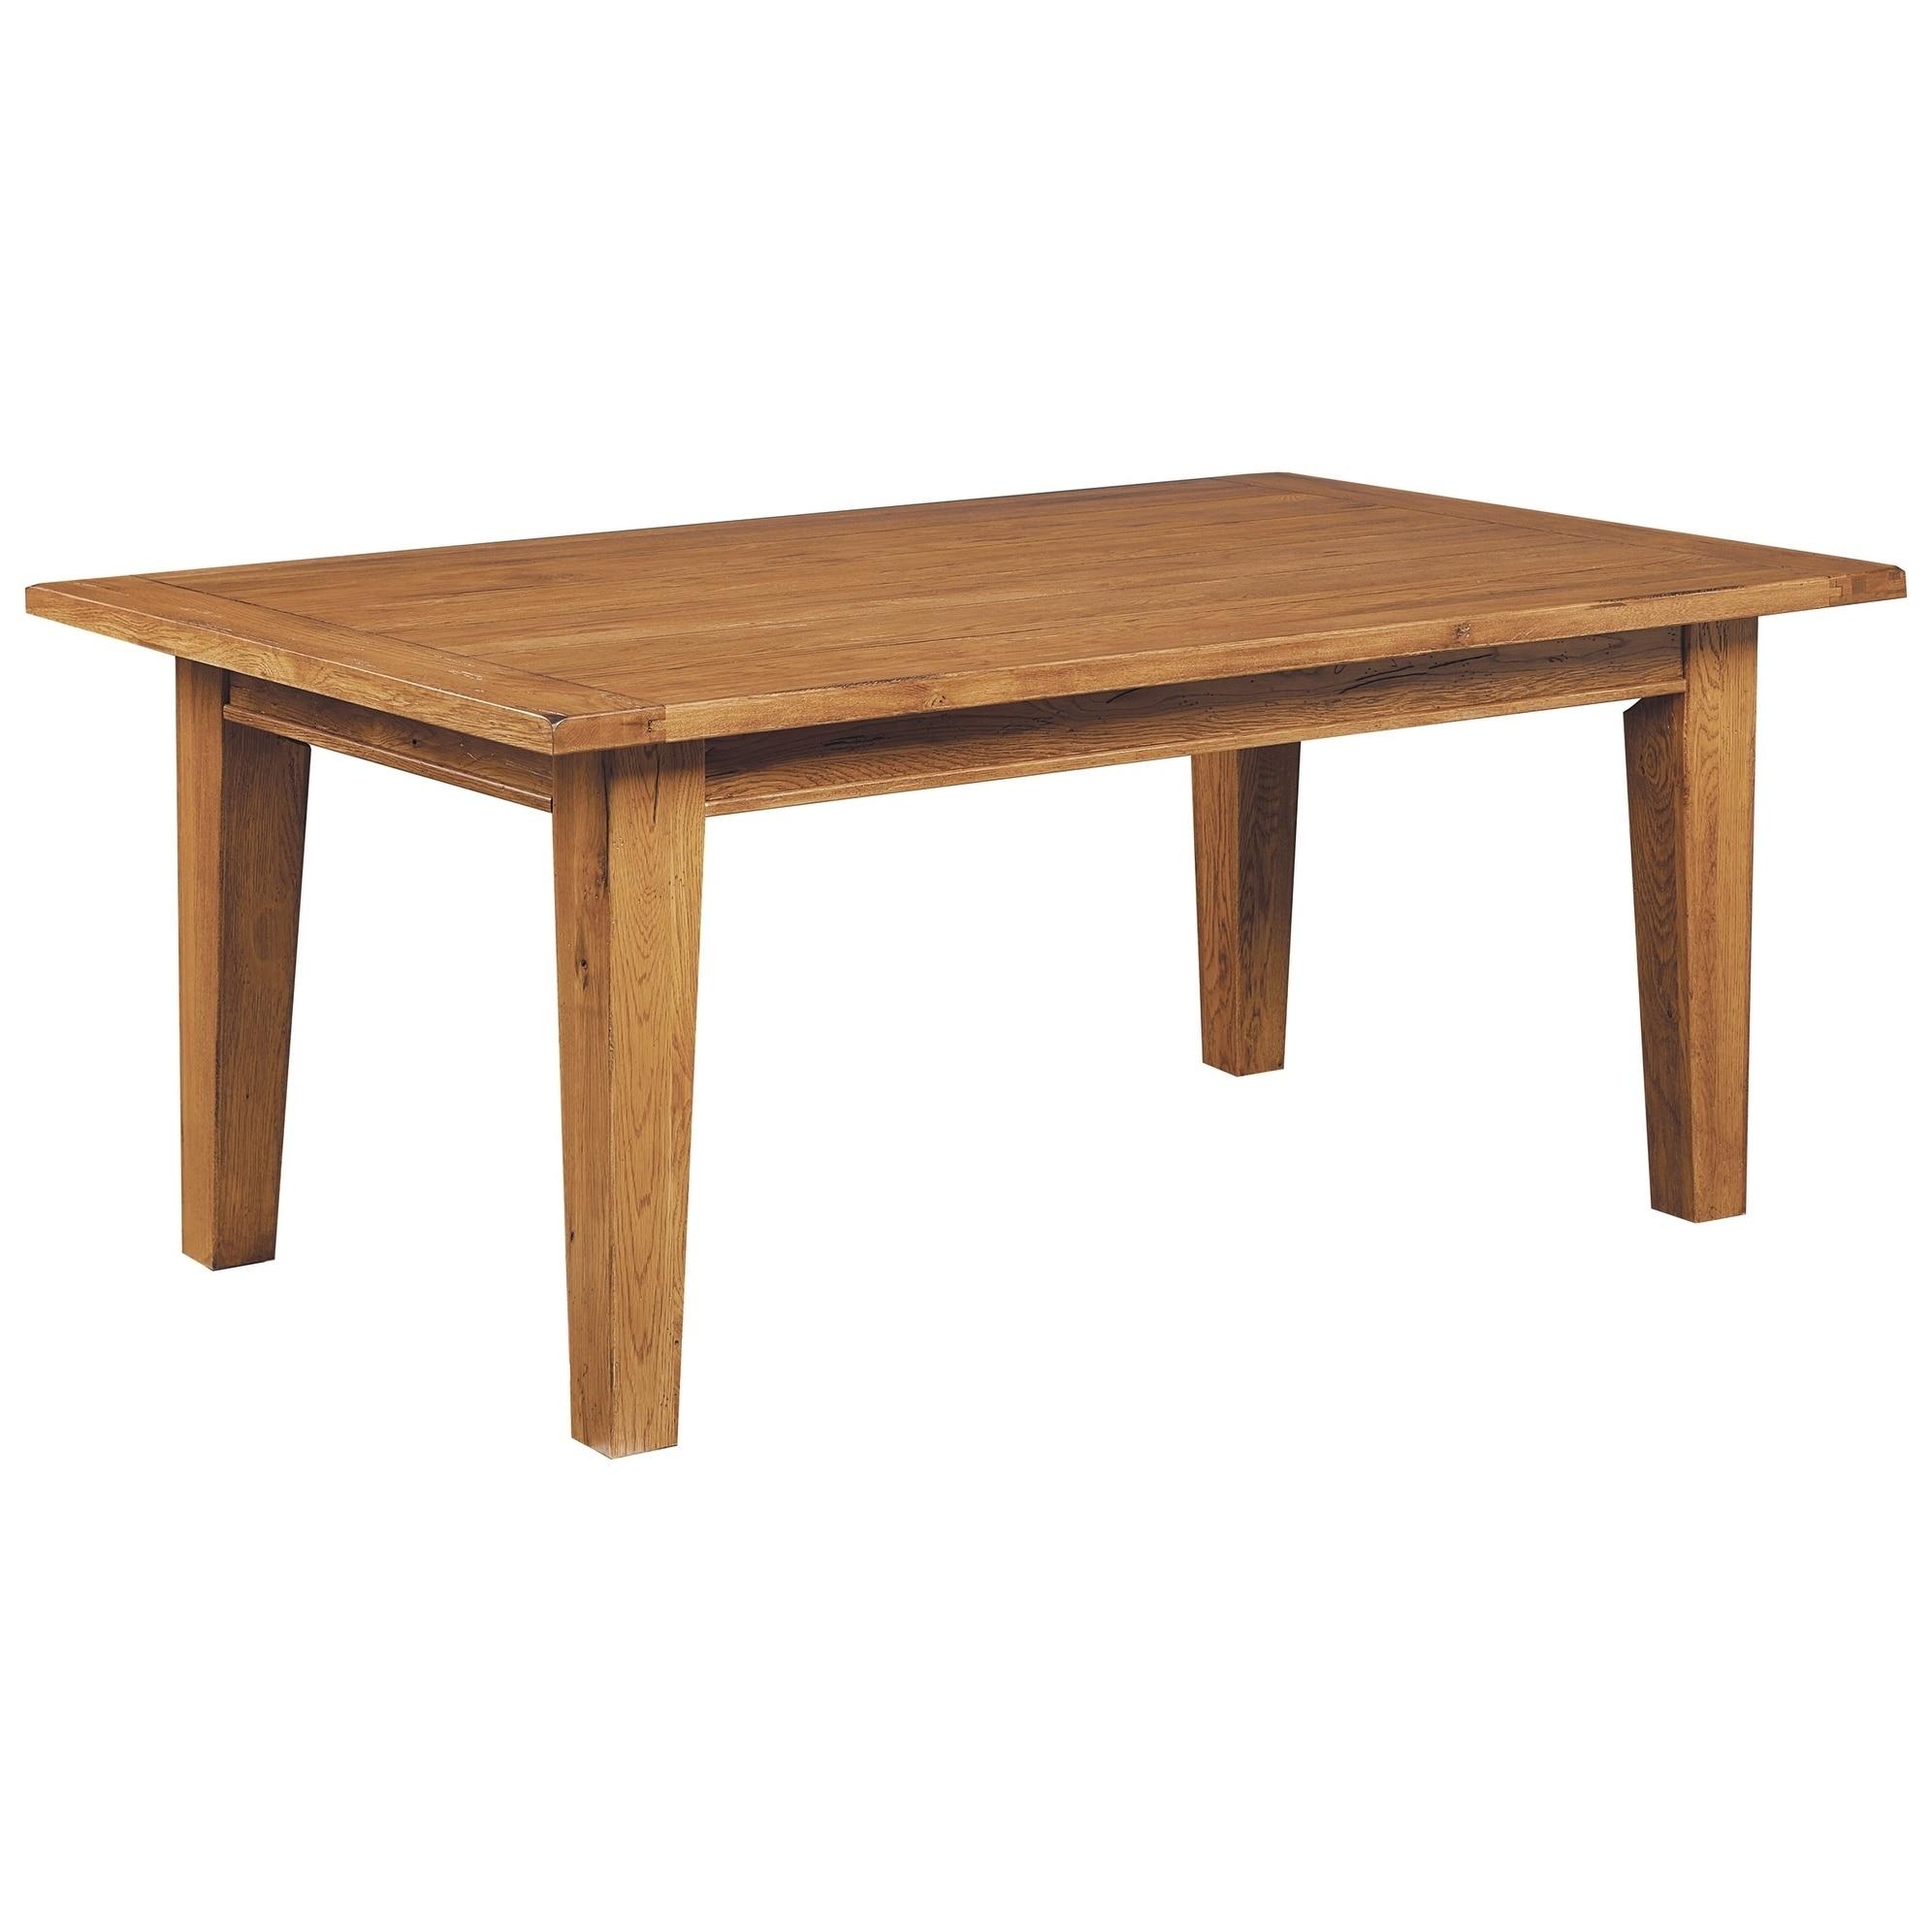 Broyhill Attic Heirlooms Rectangular Leg Dining Table Brown Overstock 21620765